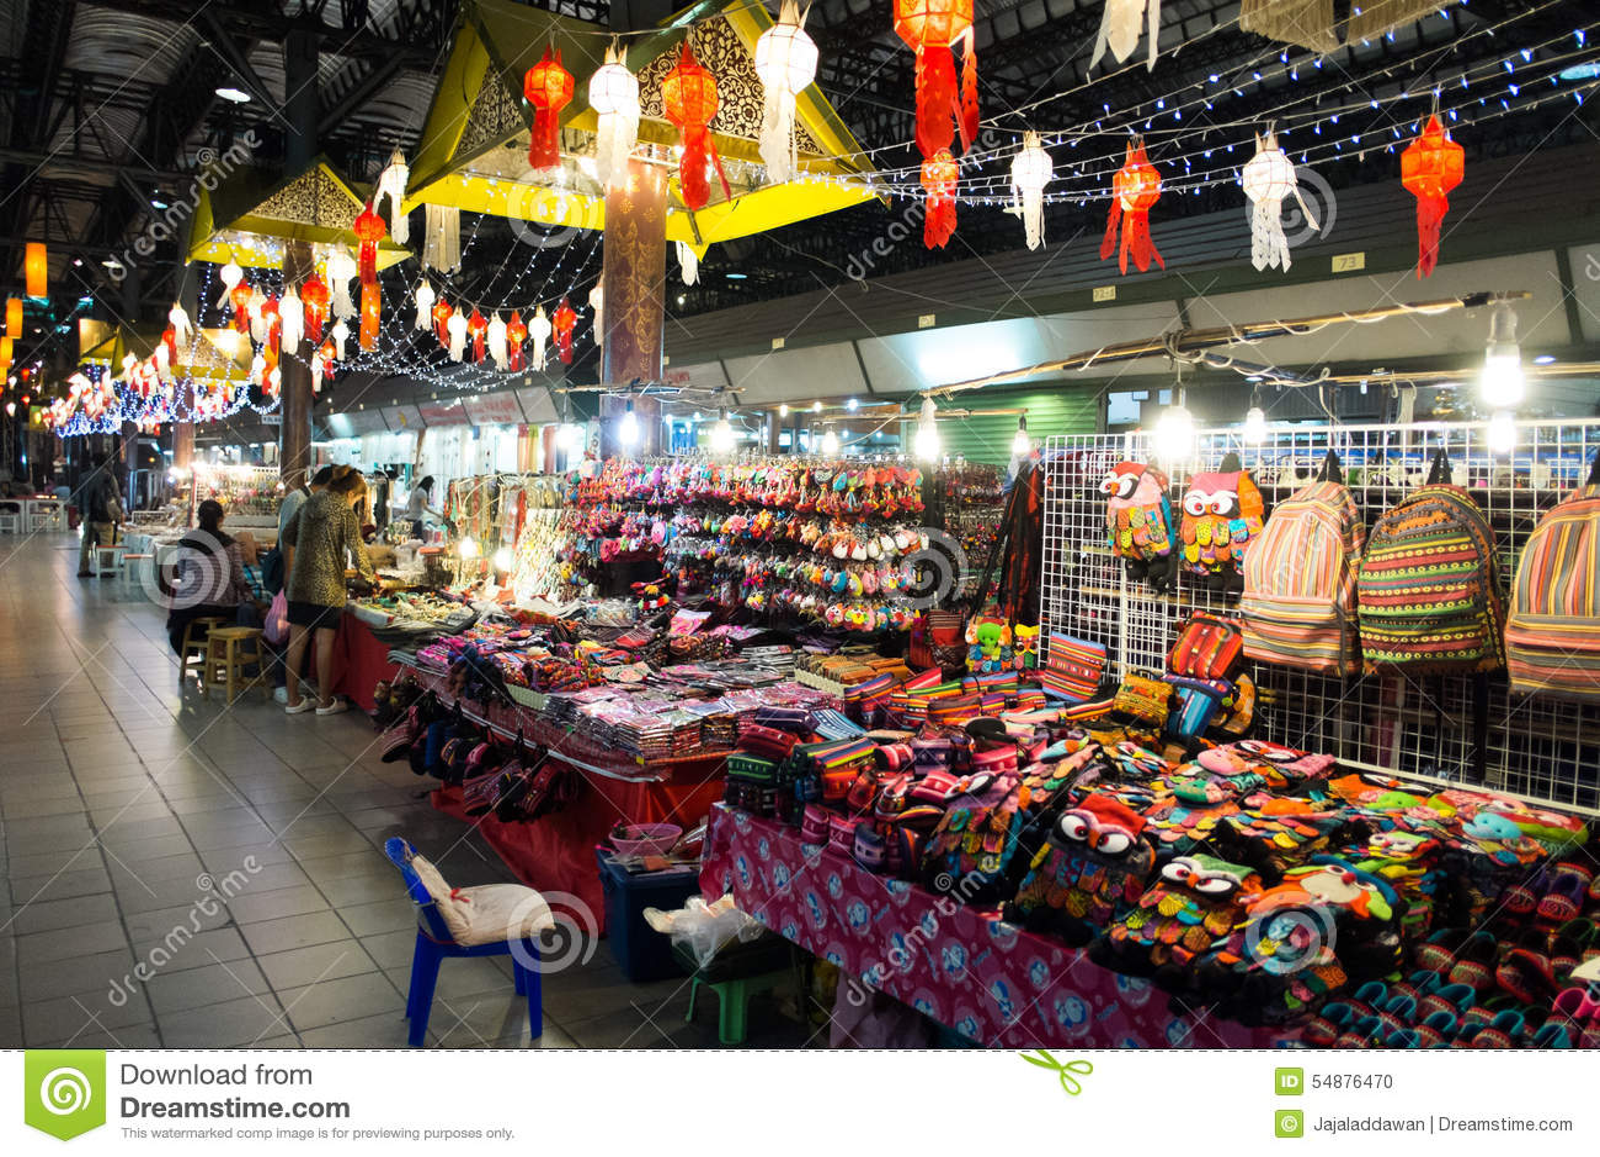 Chiang Mai Night Bazaar Editorial Image - Image: 54876470